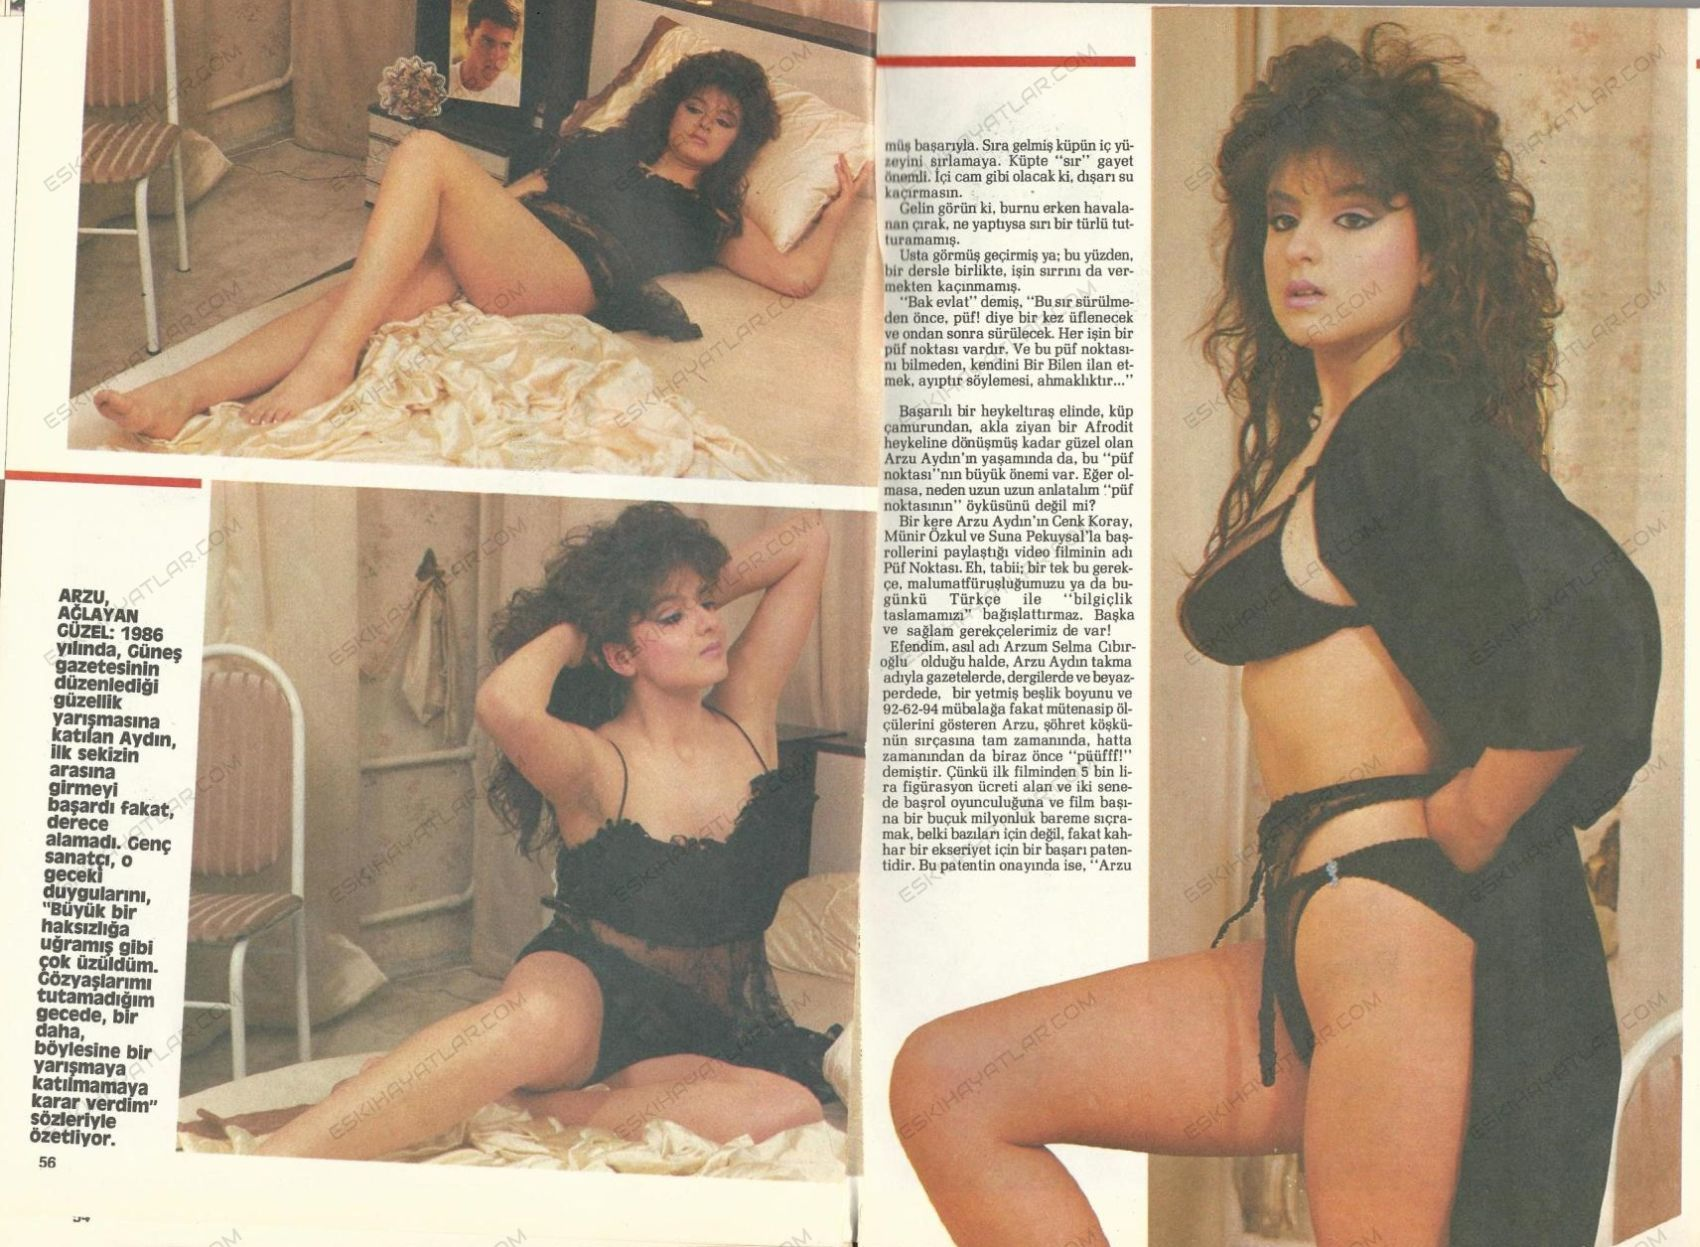 0323-arzu-caglayan-roportaji-1987-erkekce-dergisi (3)